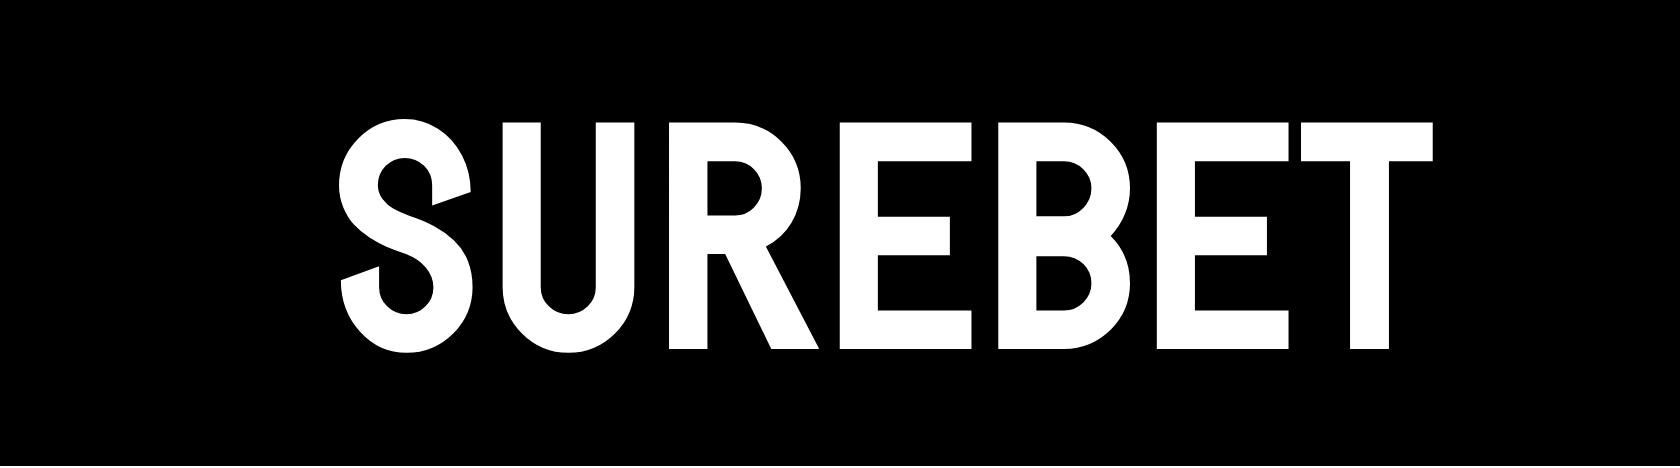 surebet - pewny zarobek